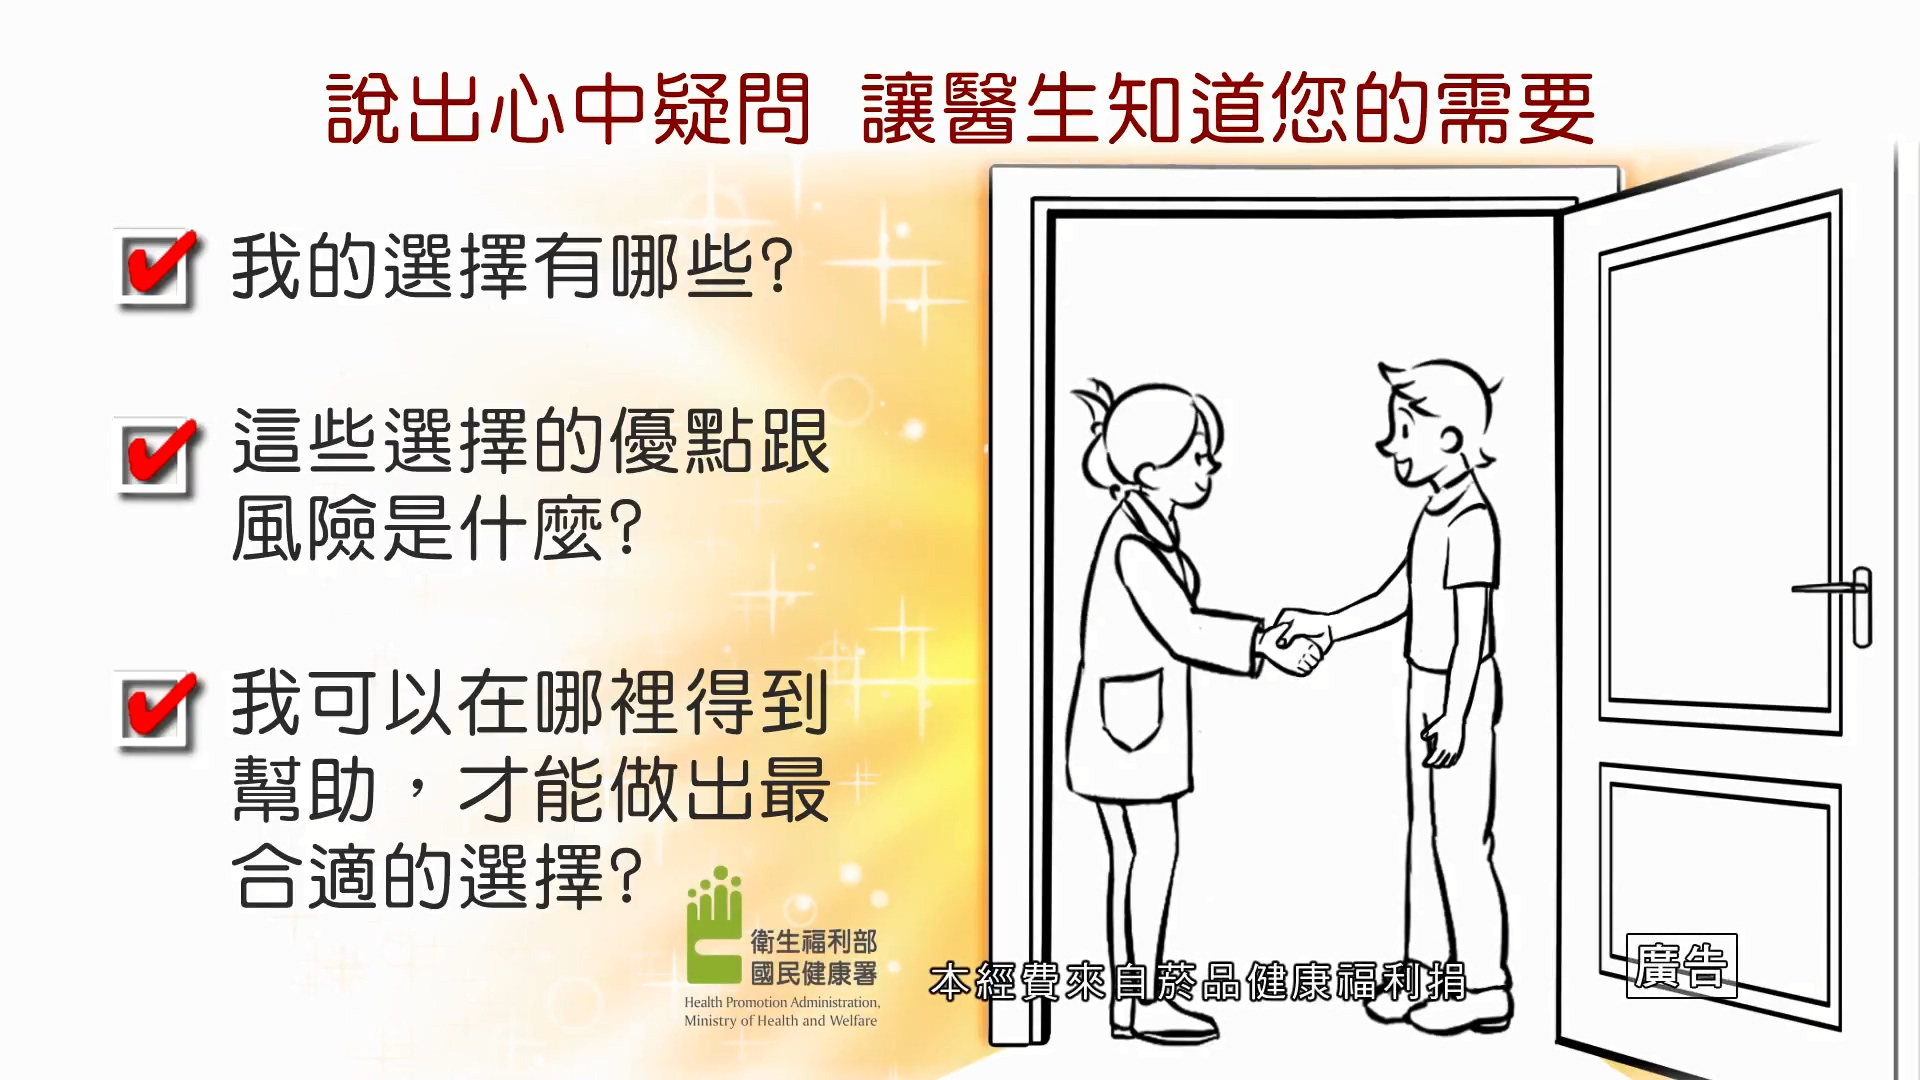 SDM 就醫3問_宣導字卡(國語)